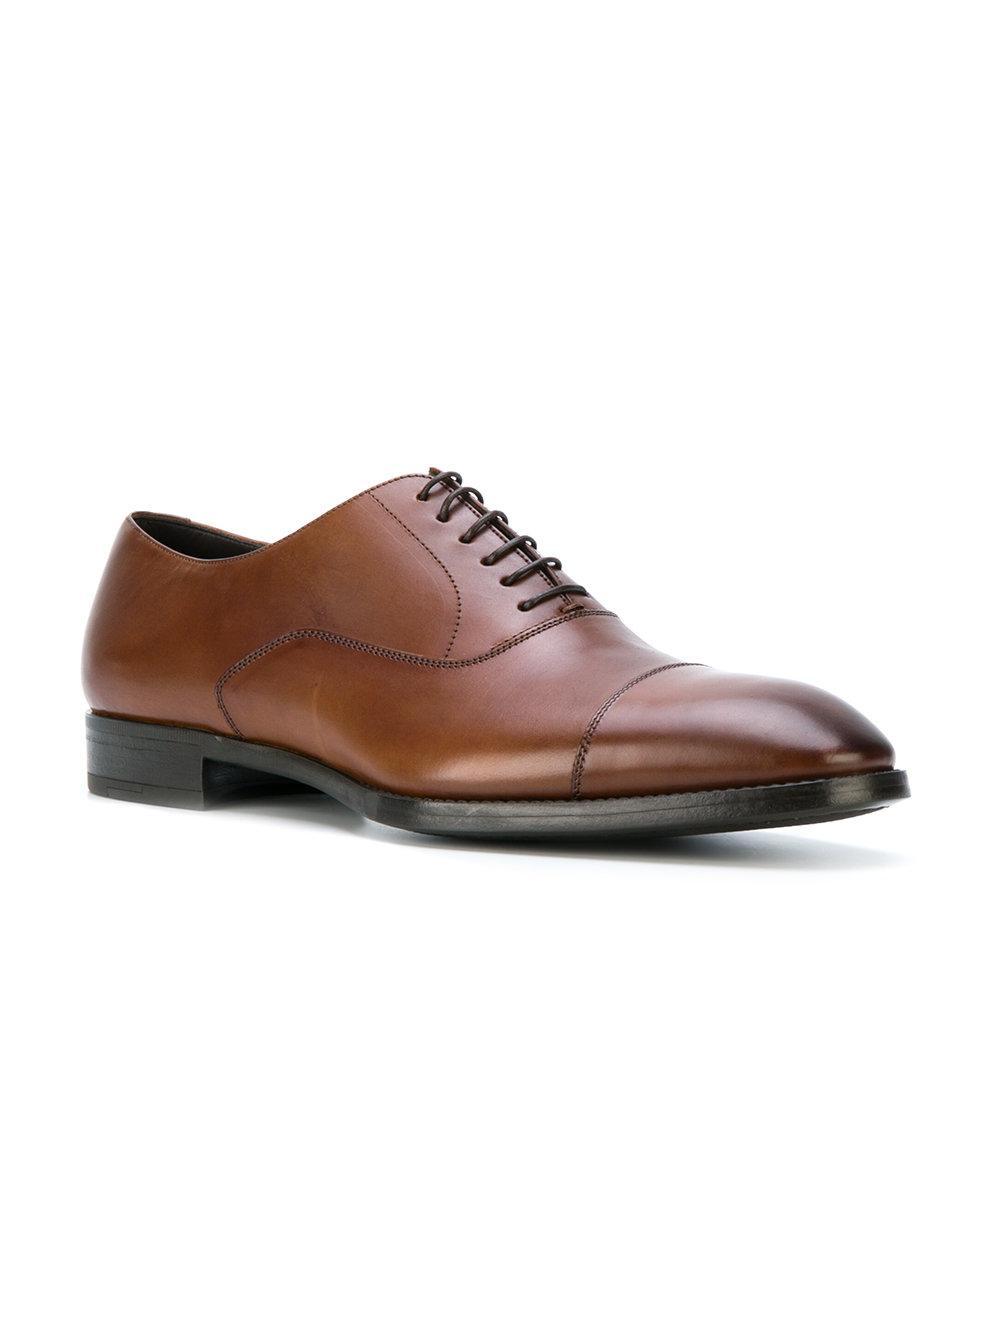 Giorgio armani Oxford Shoes in Brown for Men | Lyst